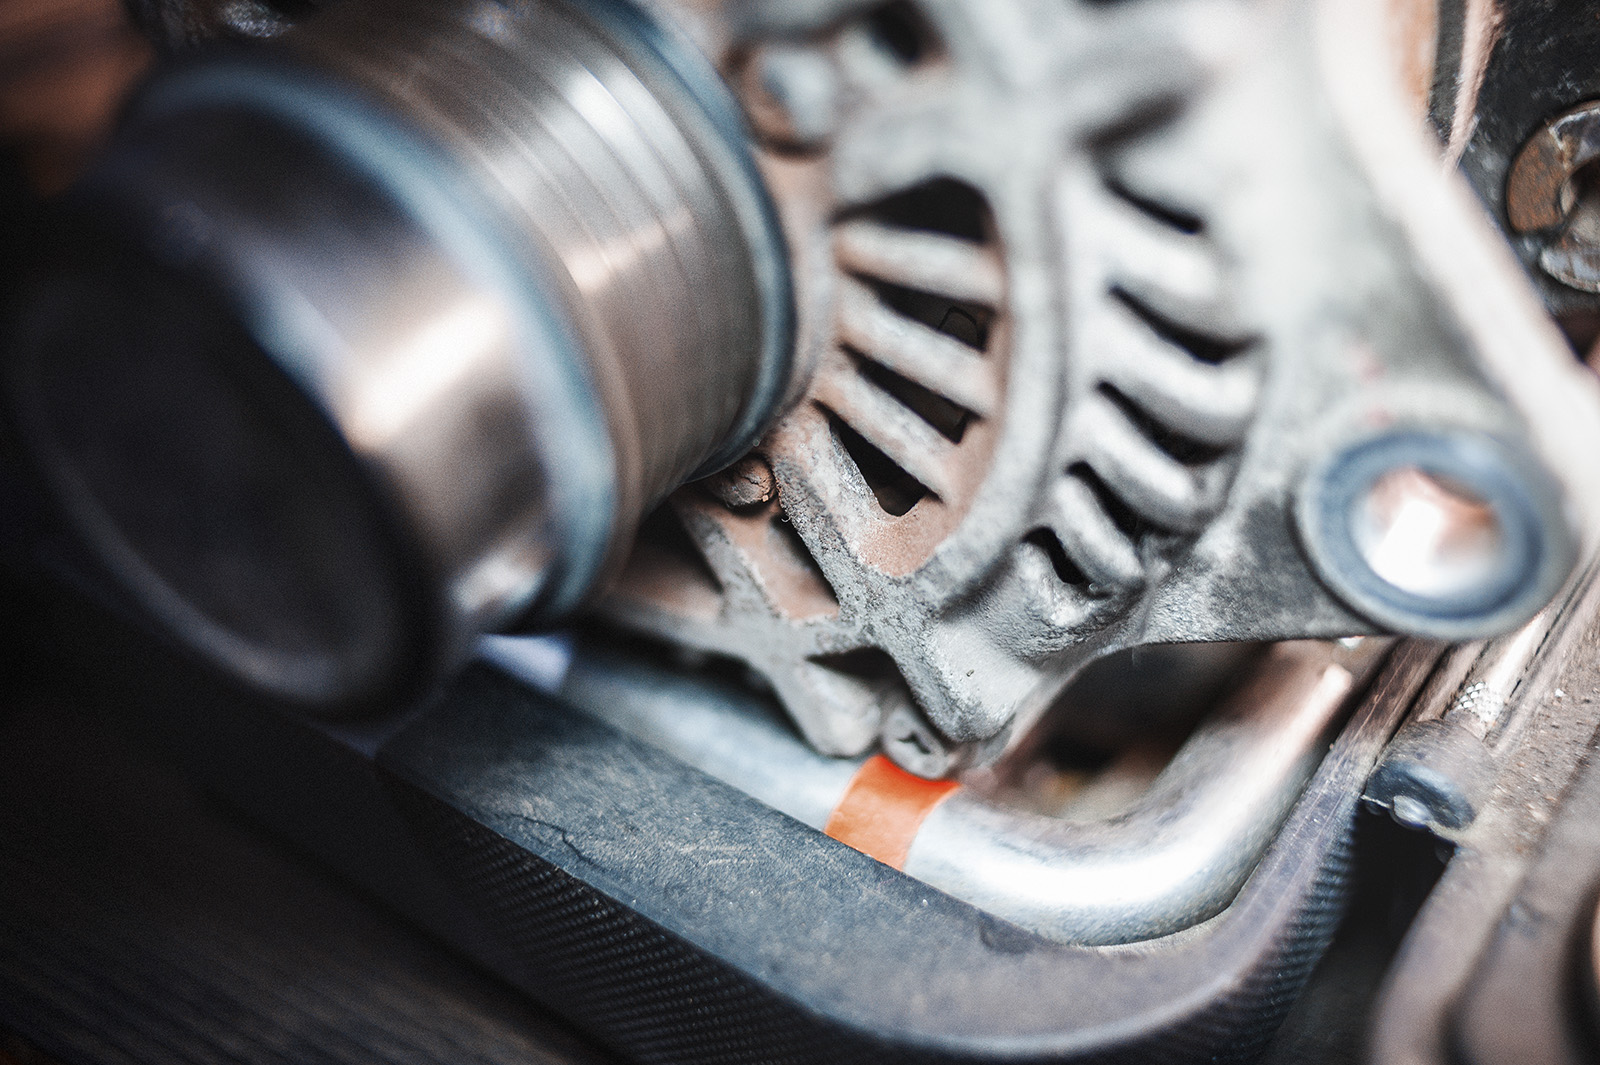 Ржавчина на генераторе Додж Калибр – предвестник ремонта